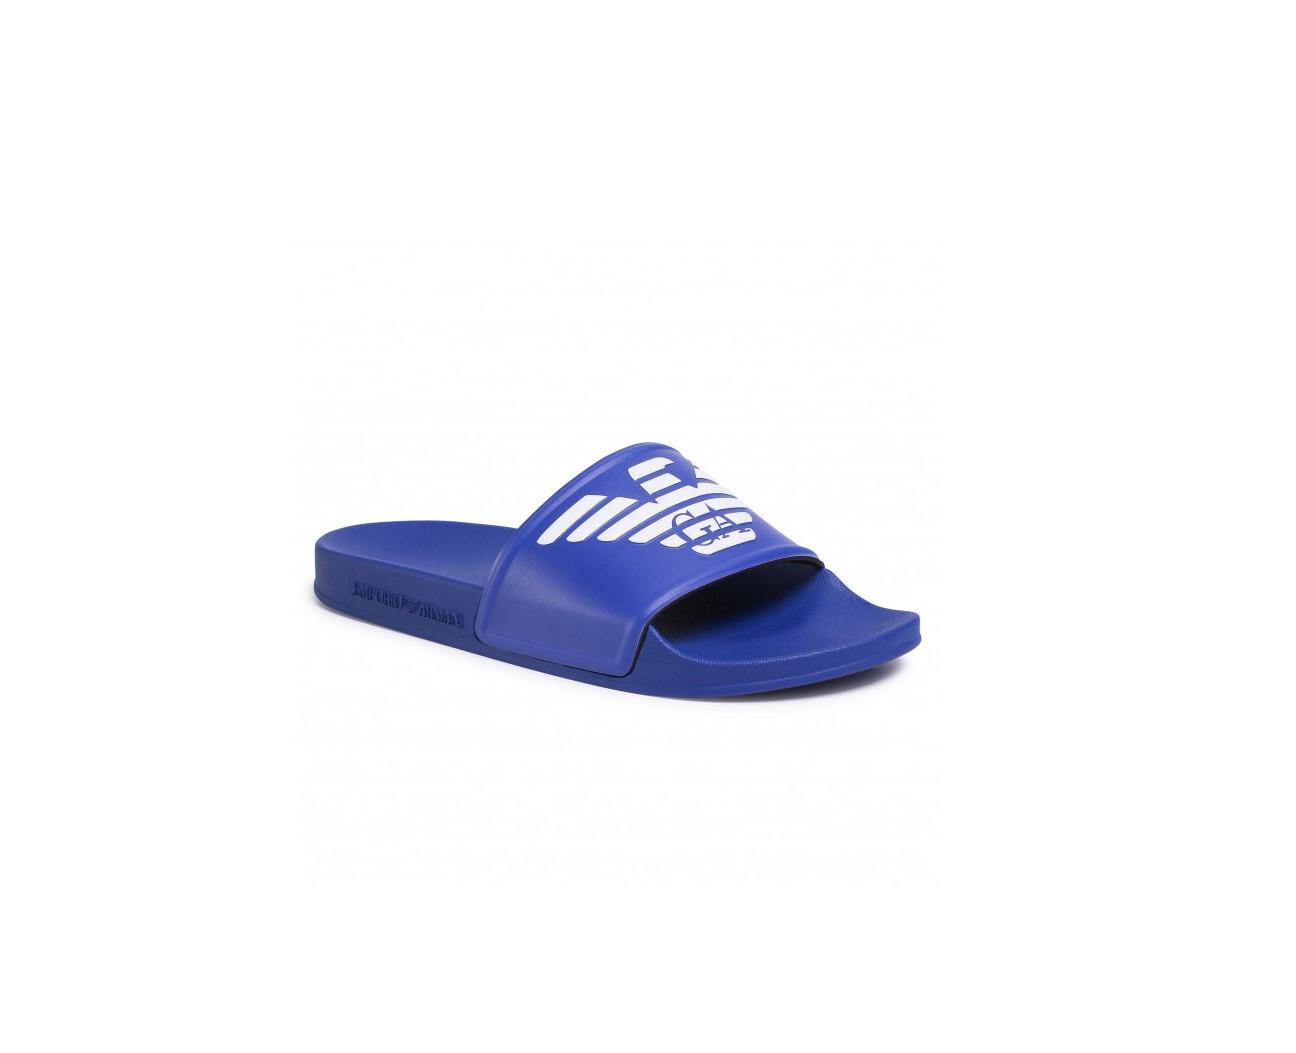 Armani Emporio Armani pánské modré pantofle